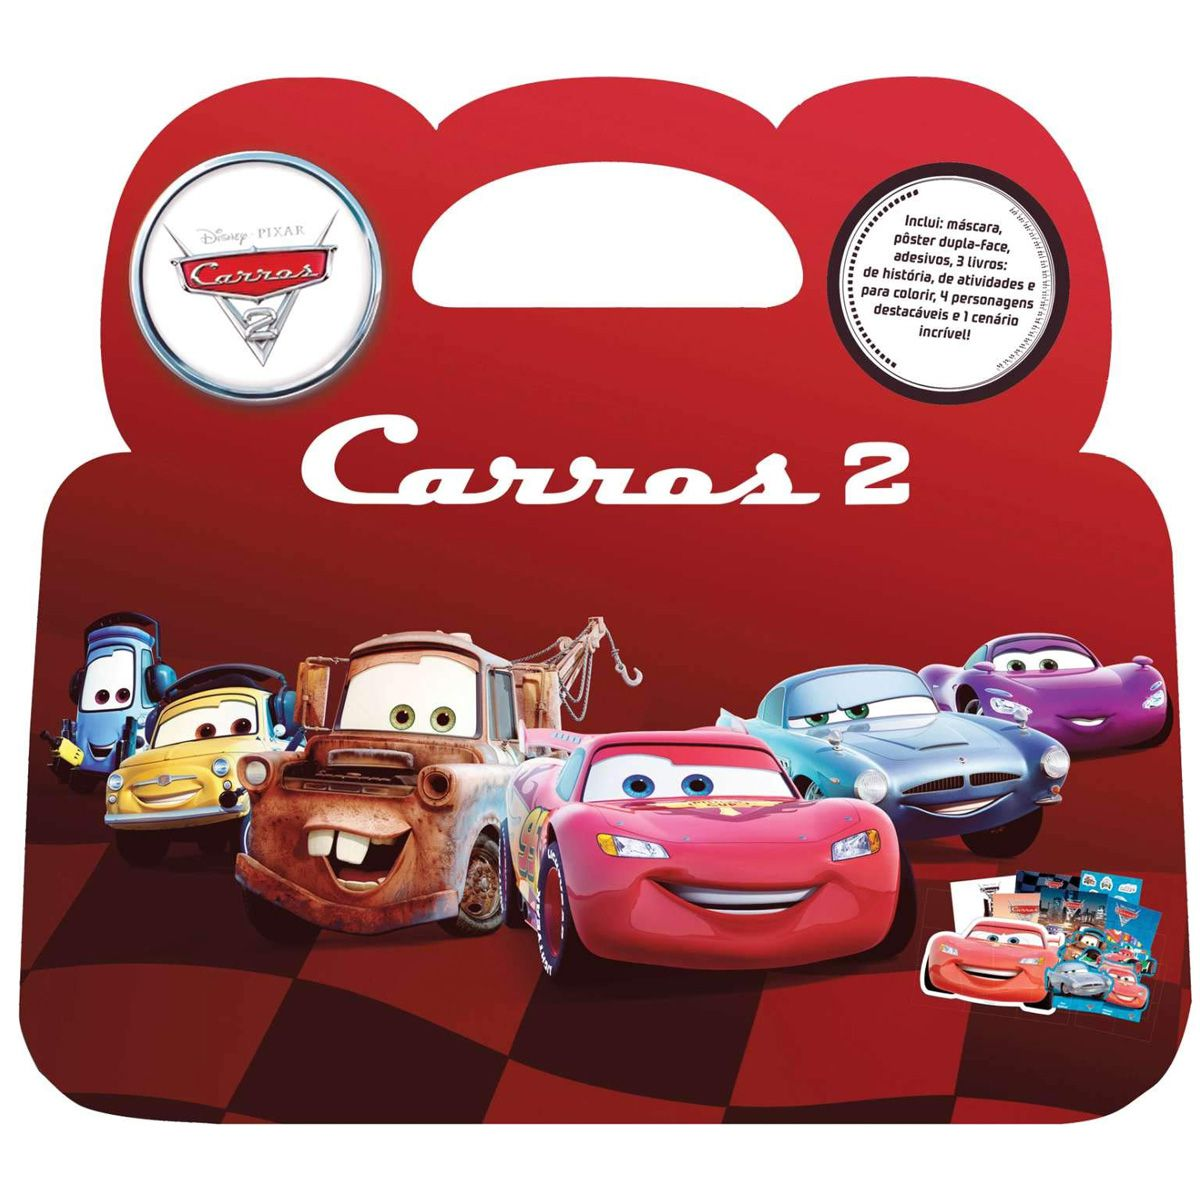 Maleta de Atividades Carros  Educacional Disney Cinema